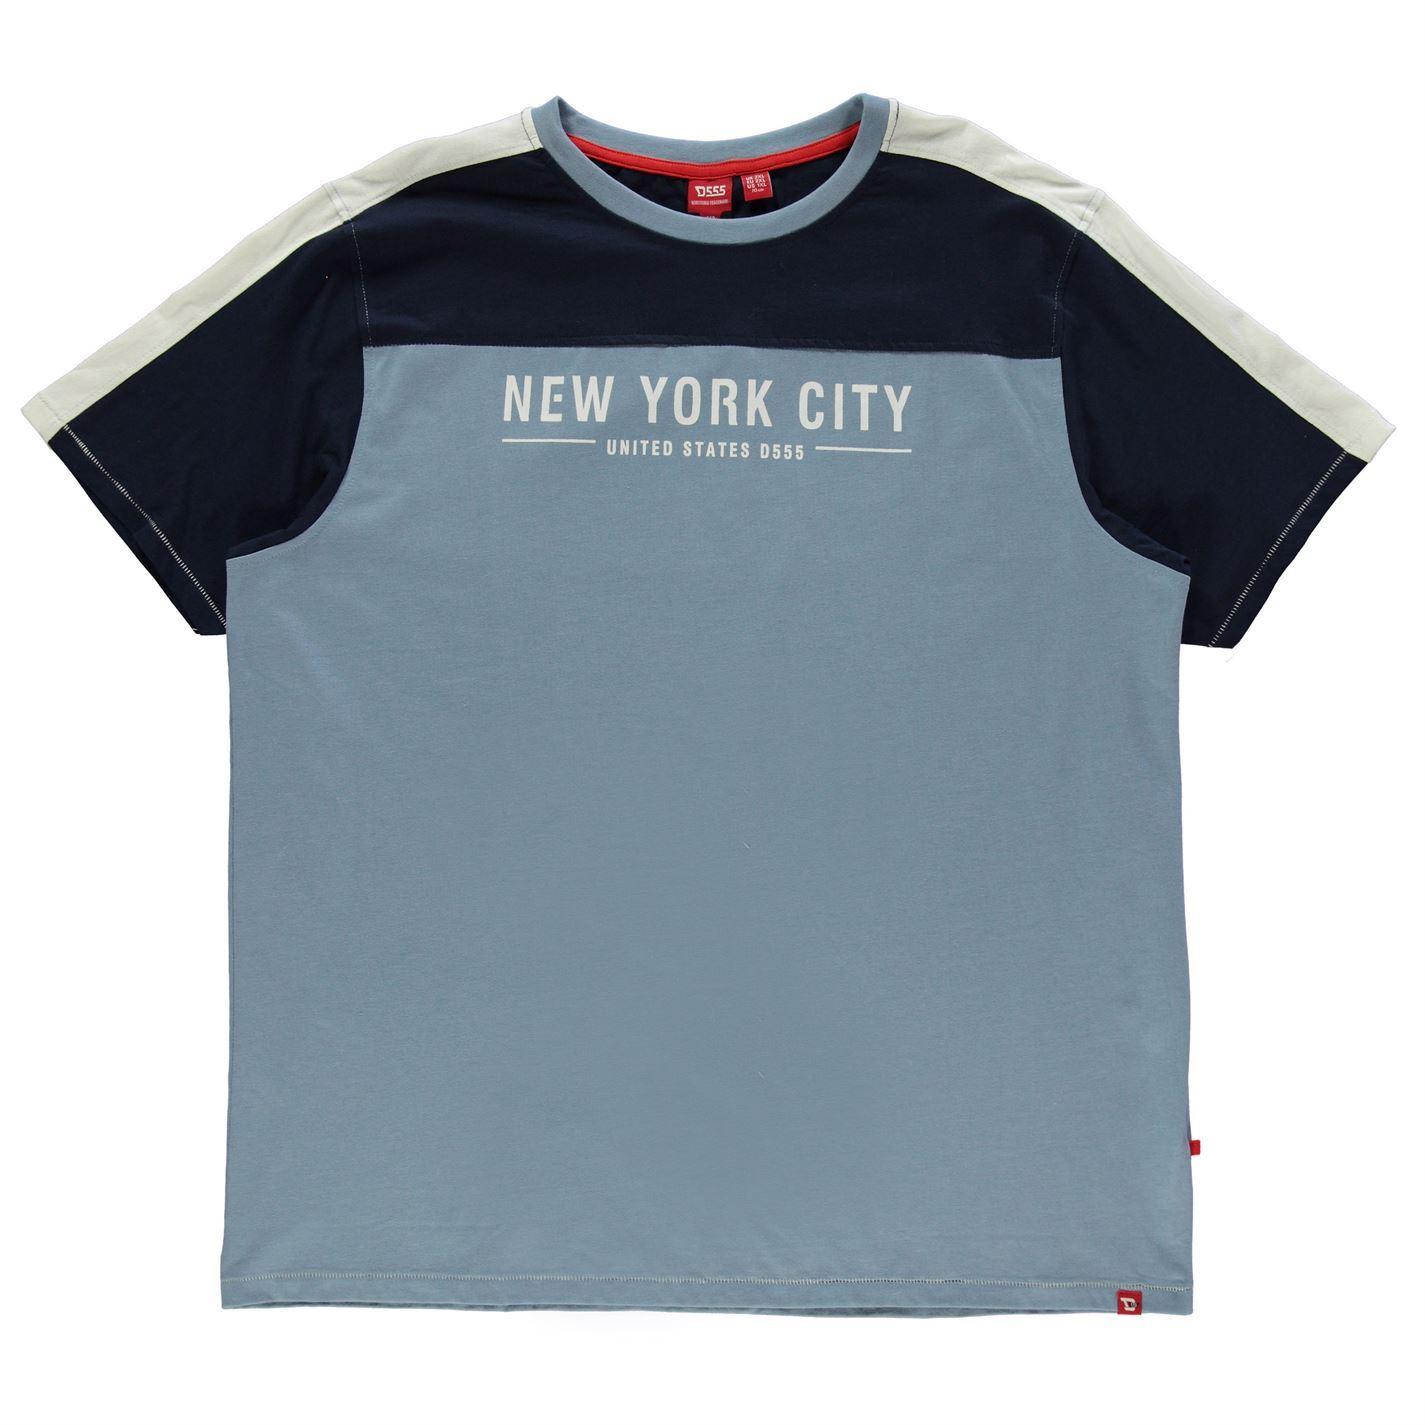 D555 New York T-Shirt Mens Top Tee Shirt Grey Marl XX-Large